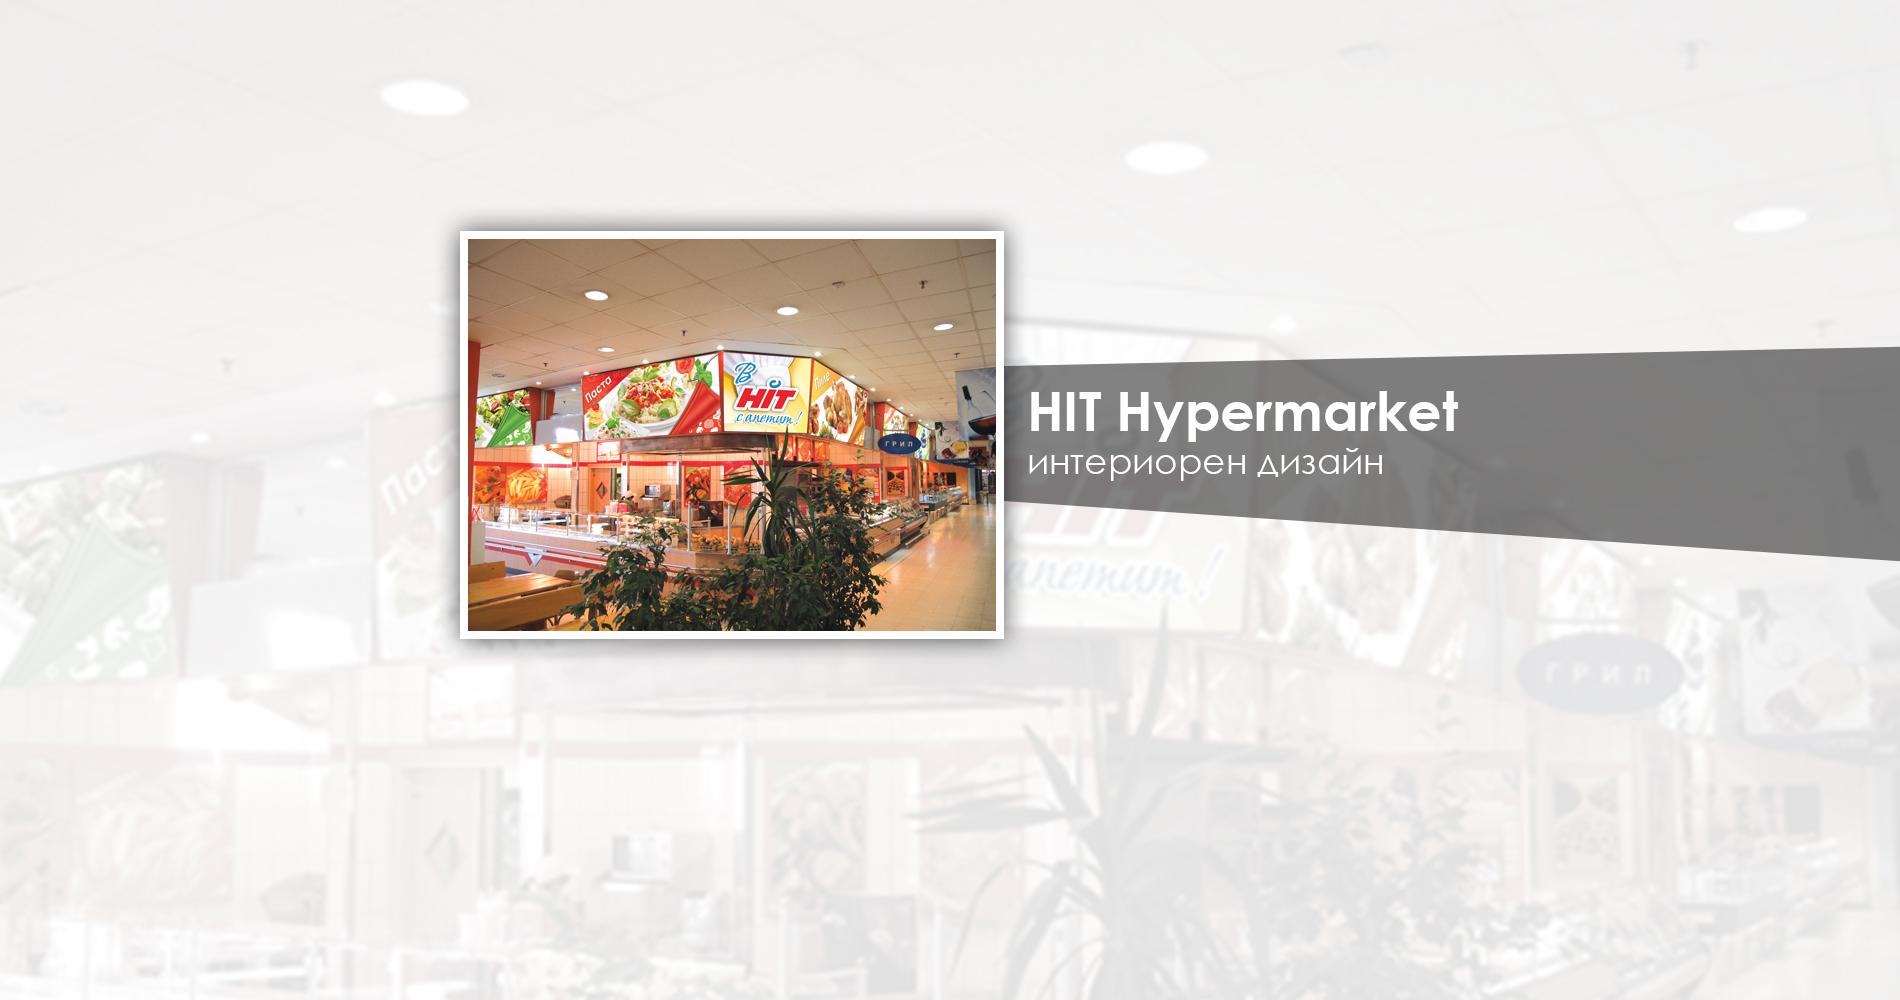 hithypermarket4